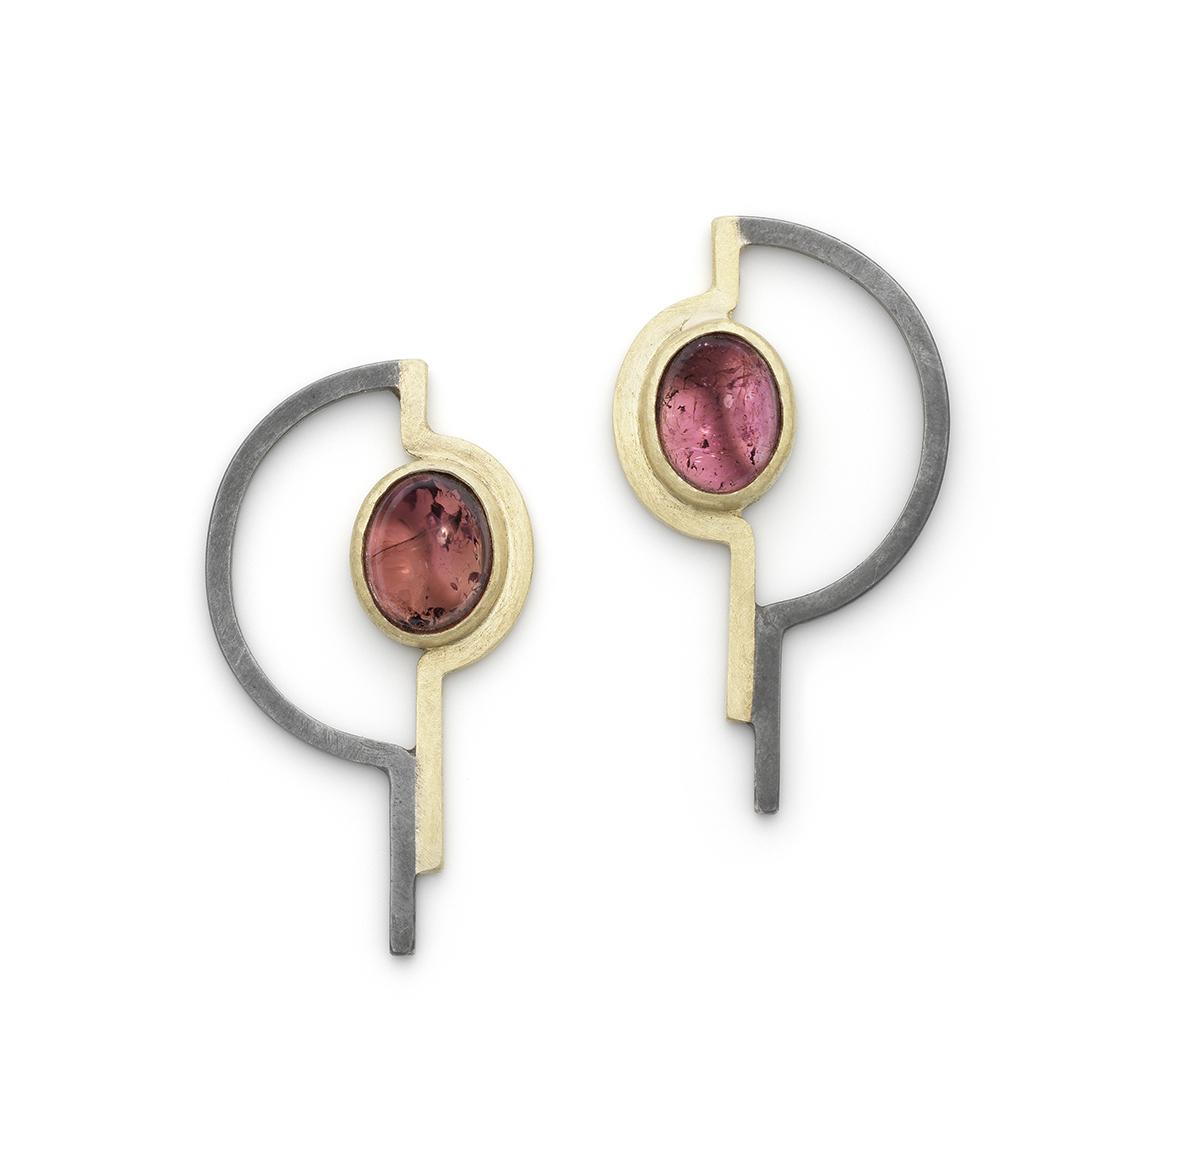 Ellen Monaghan Pink tourmaline semi curl earrings oxi siver 18kt gold.jpg